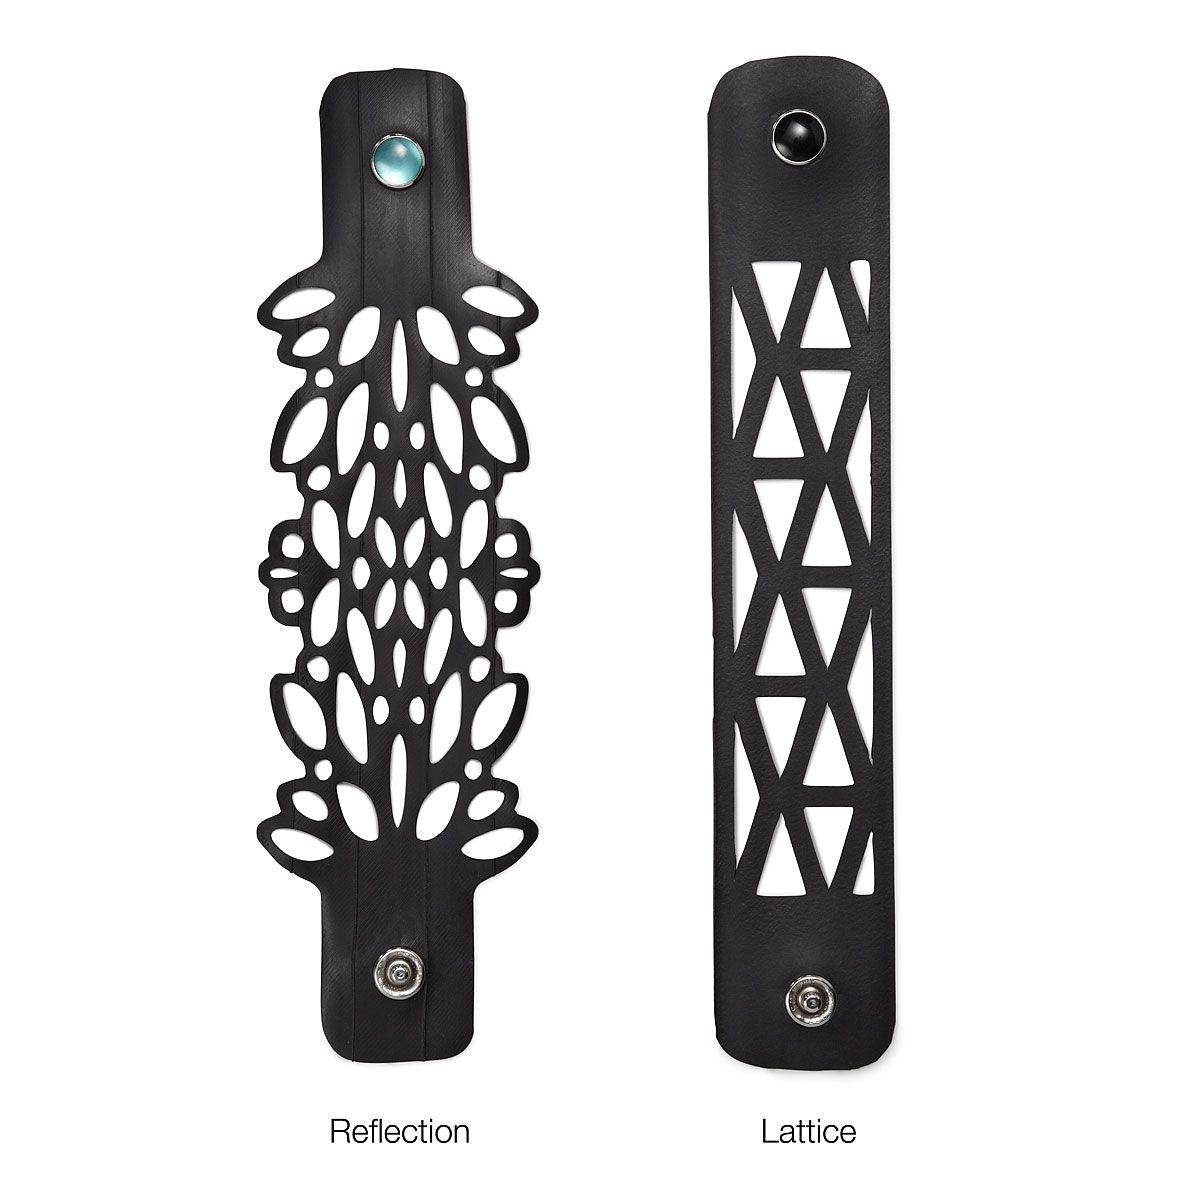 inner tube bracelet andere lederk nstler fahrradschlauch schmuck selber herstellen und armband. Black Bedroom Furniture Sets. Home Design Ideas